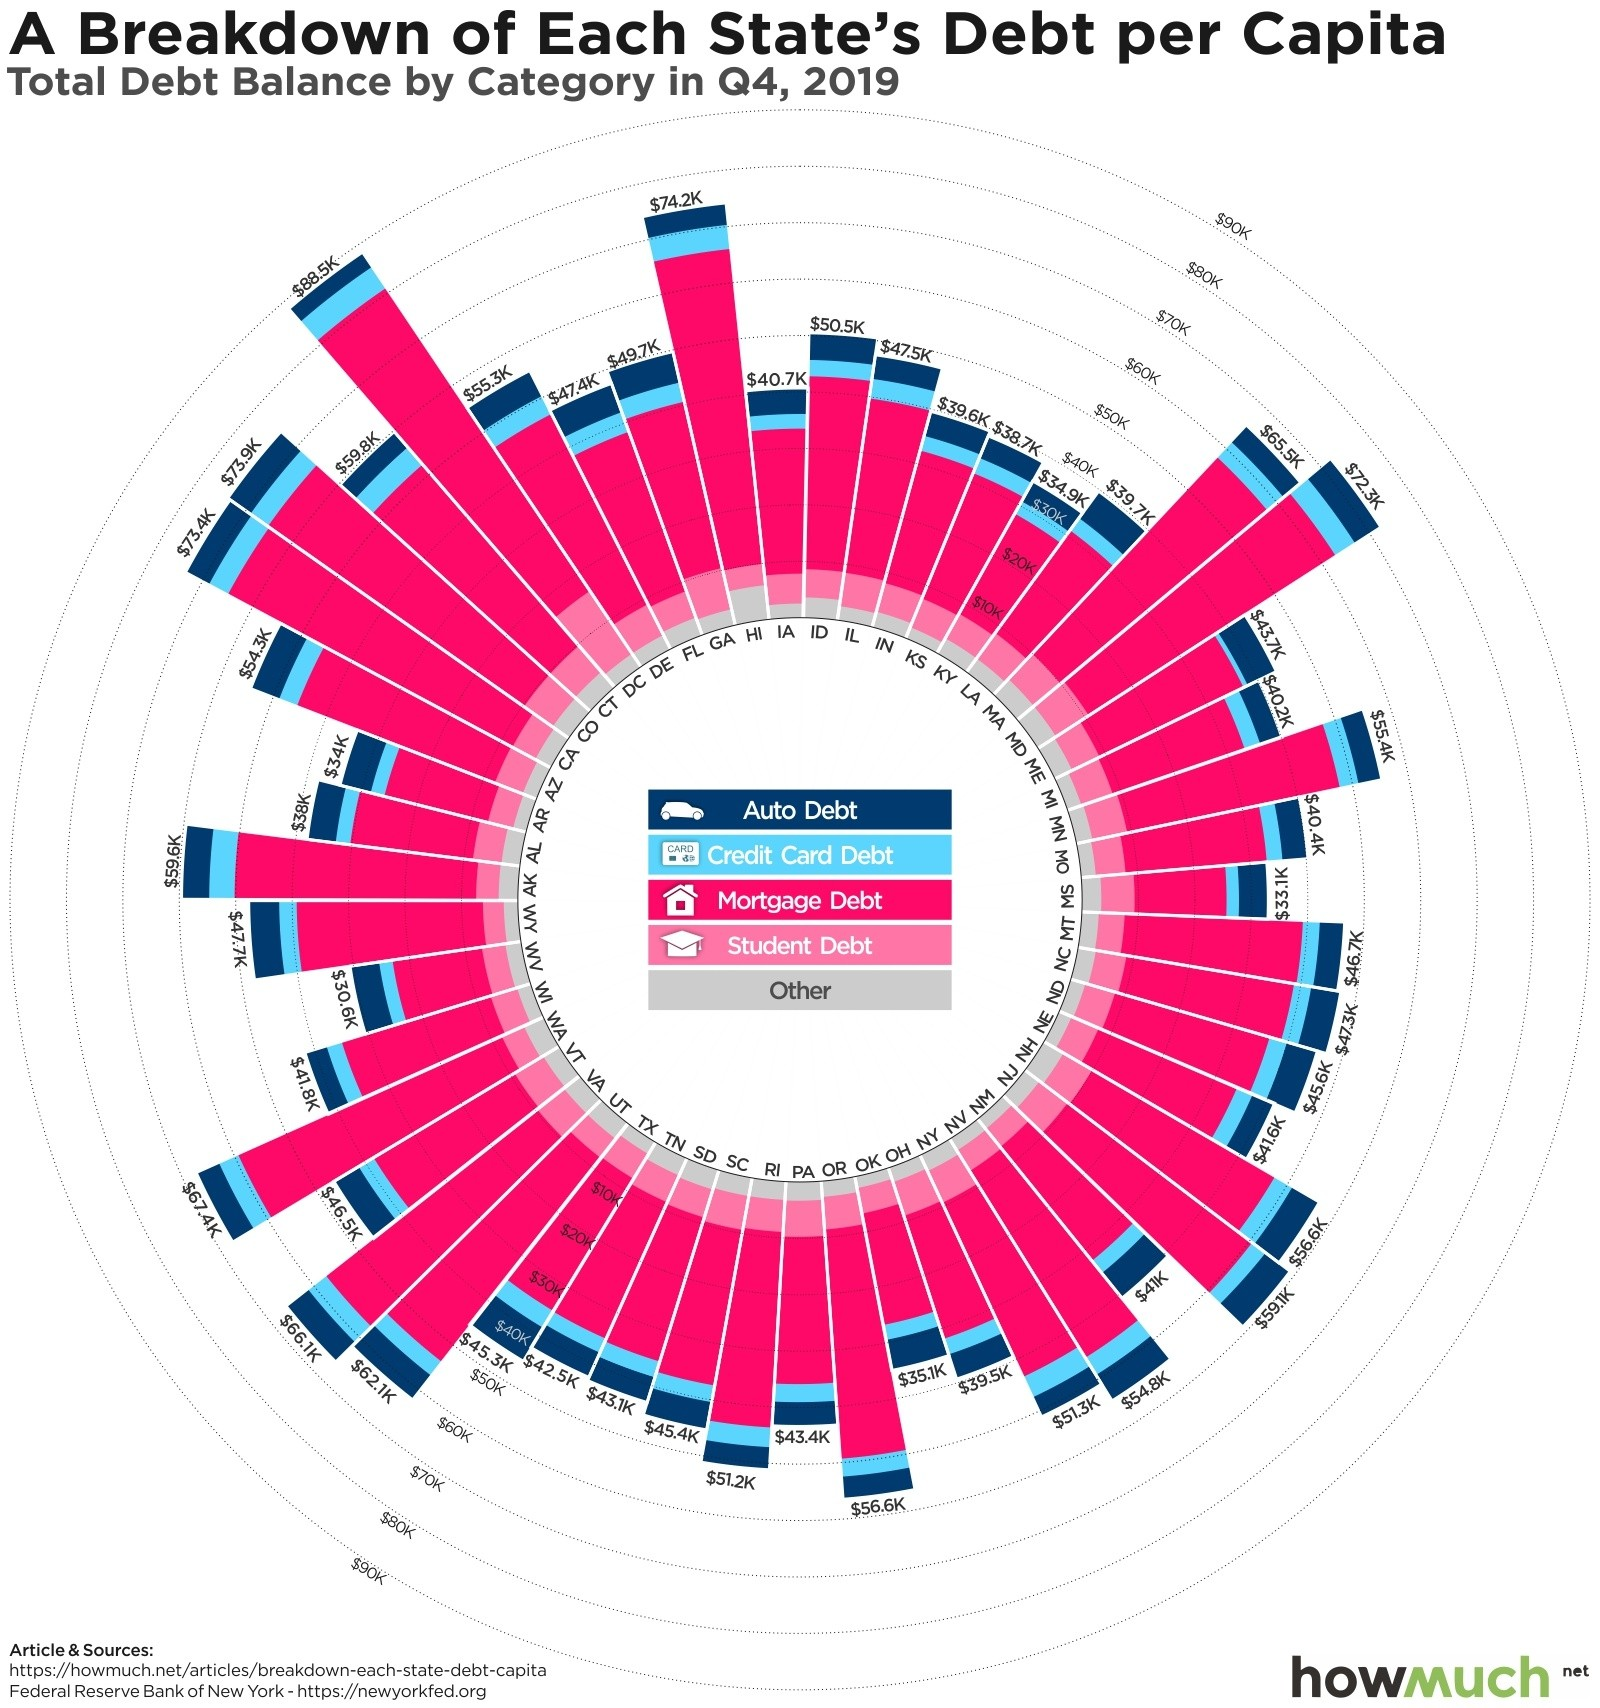 State debt per capita breakdown